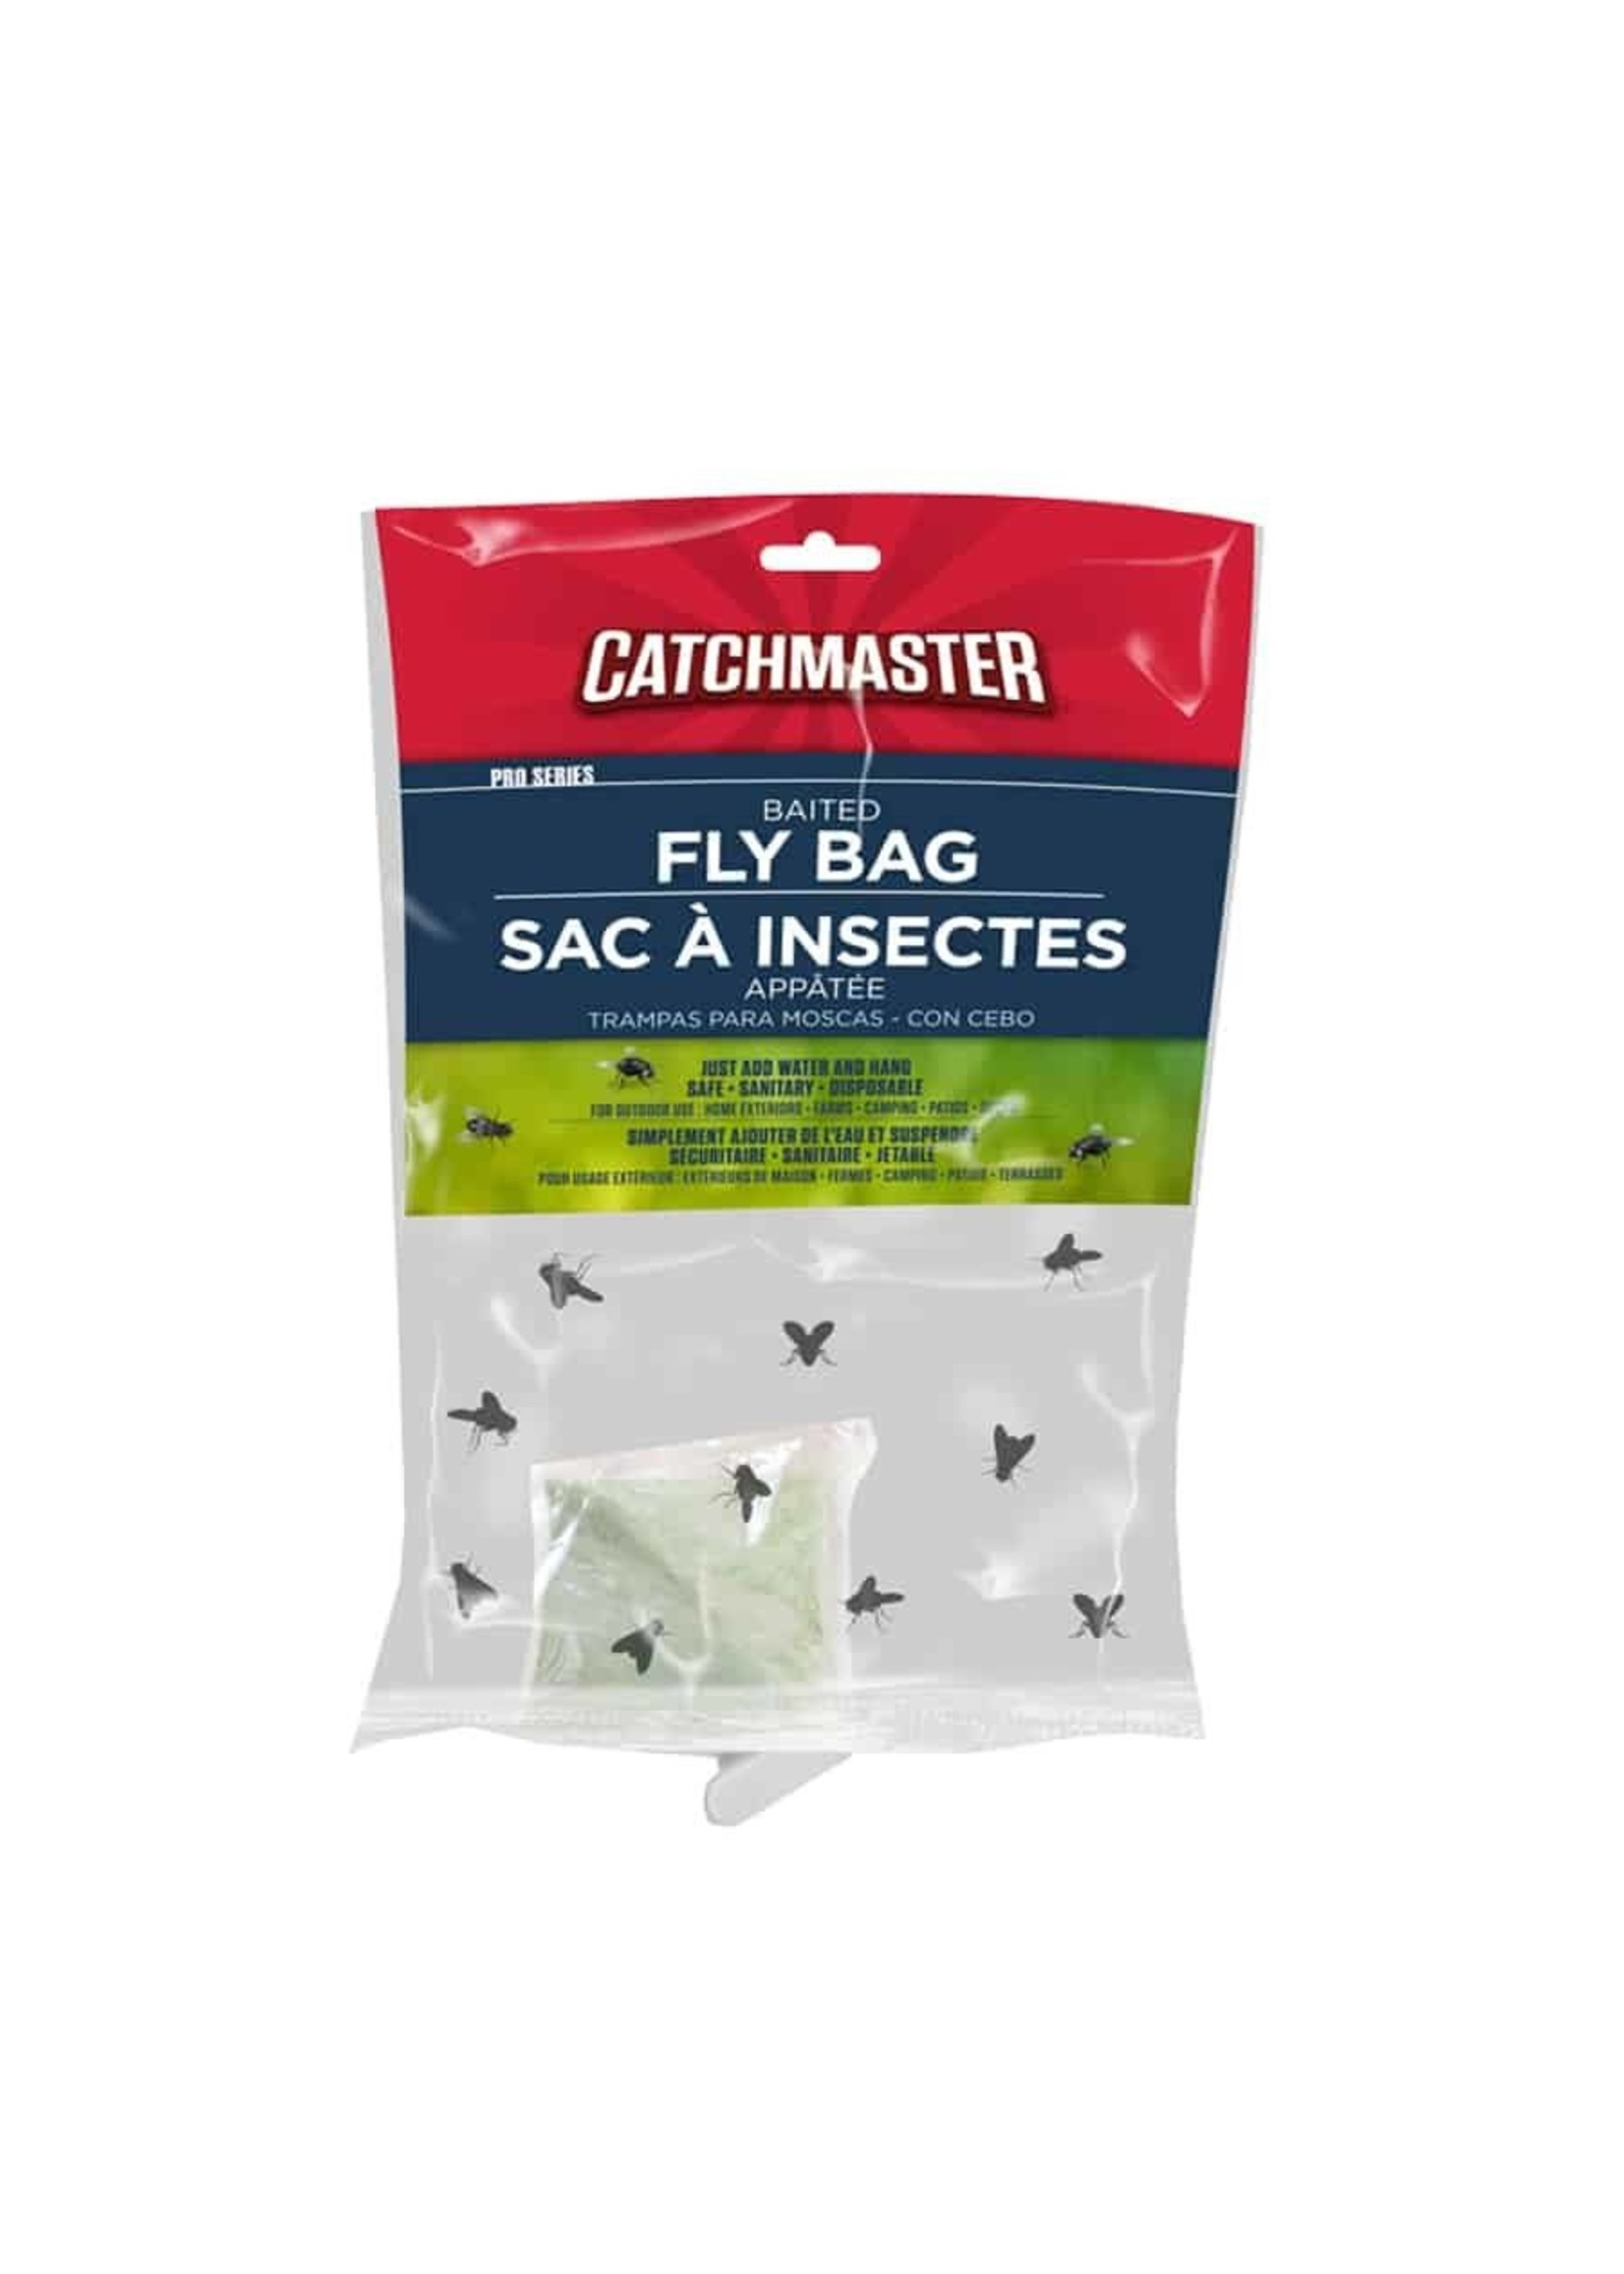 Cathmaster Sac à insectes appâtée Catchmaster Pro series